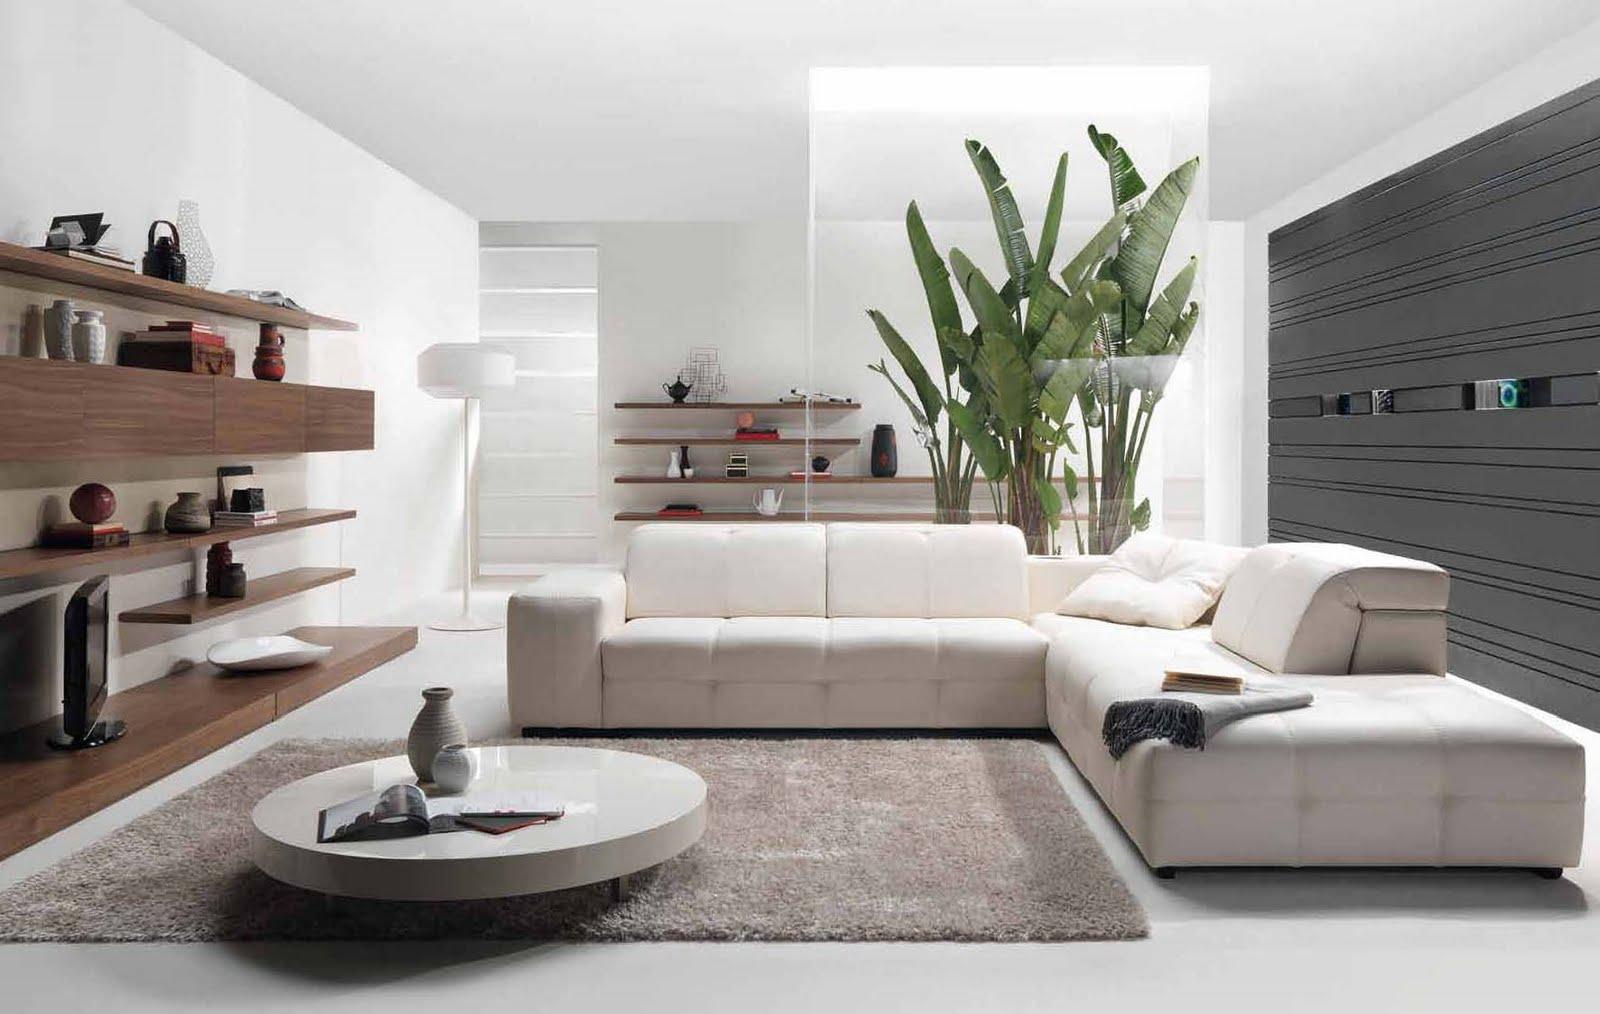 White-Living-Room-Interior-Style-Modern-Kits-Furniture